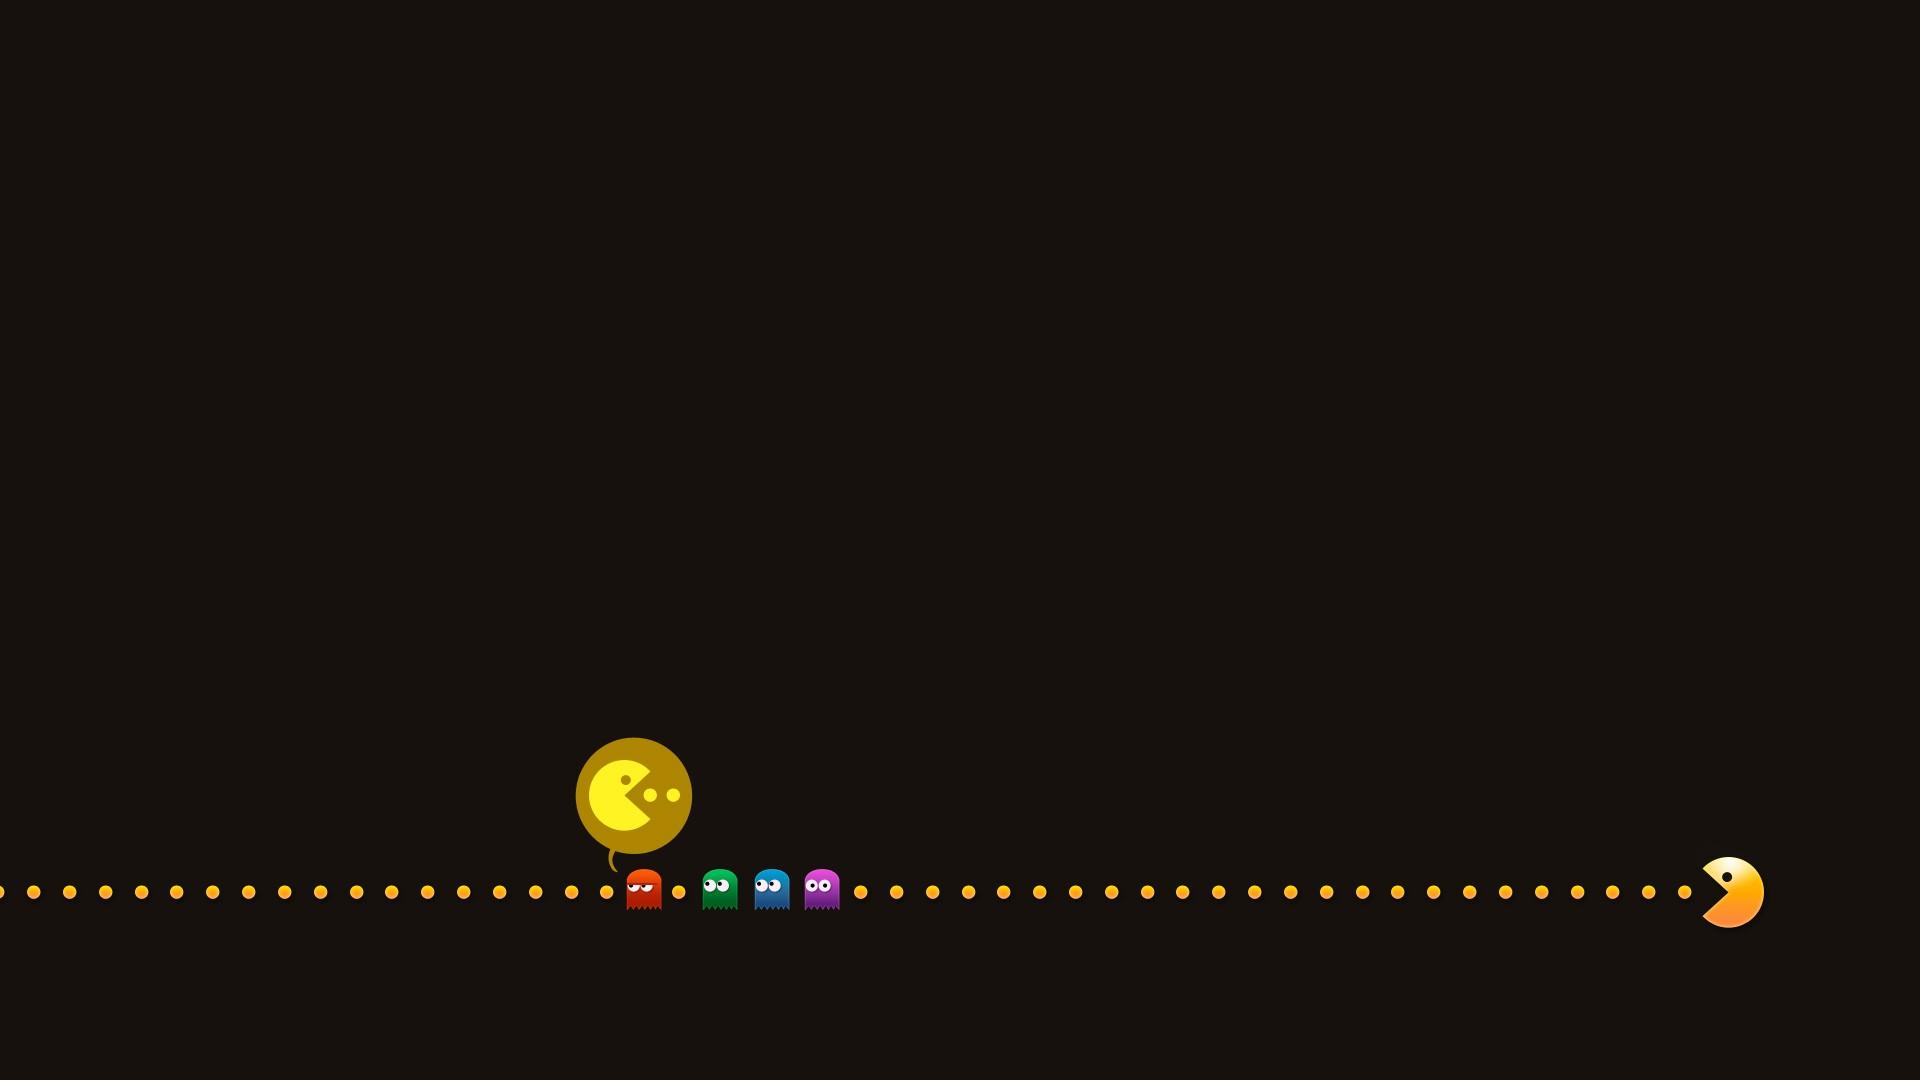 Pubg Dual Monitor Wallpaper  Pac Man Computer Wallpapers Desktop Backgrounds